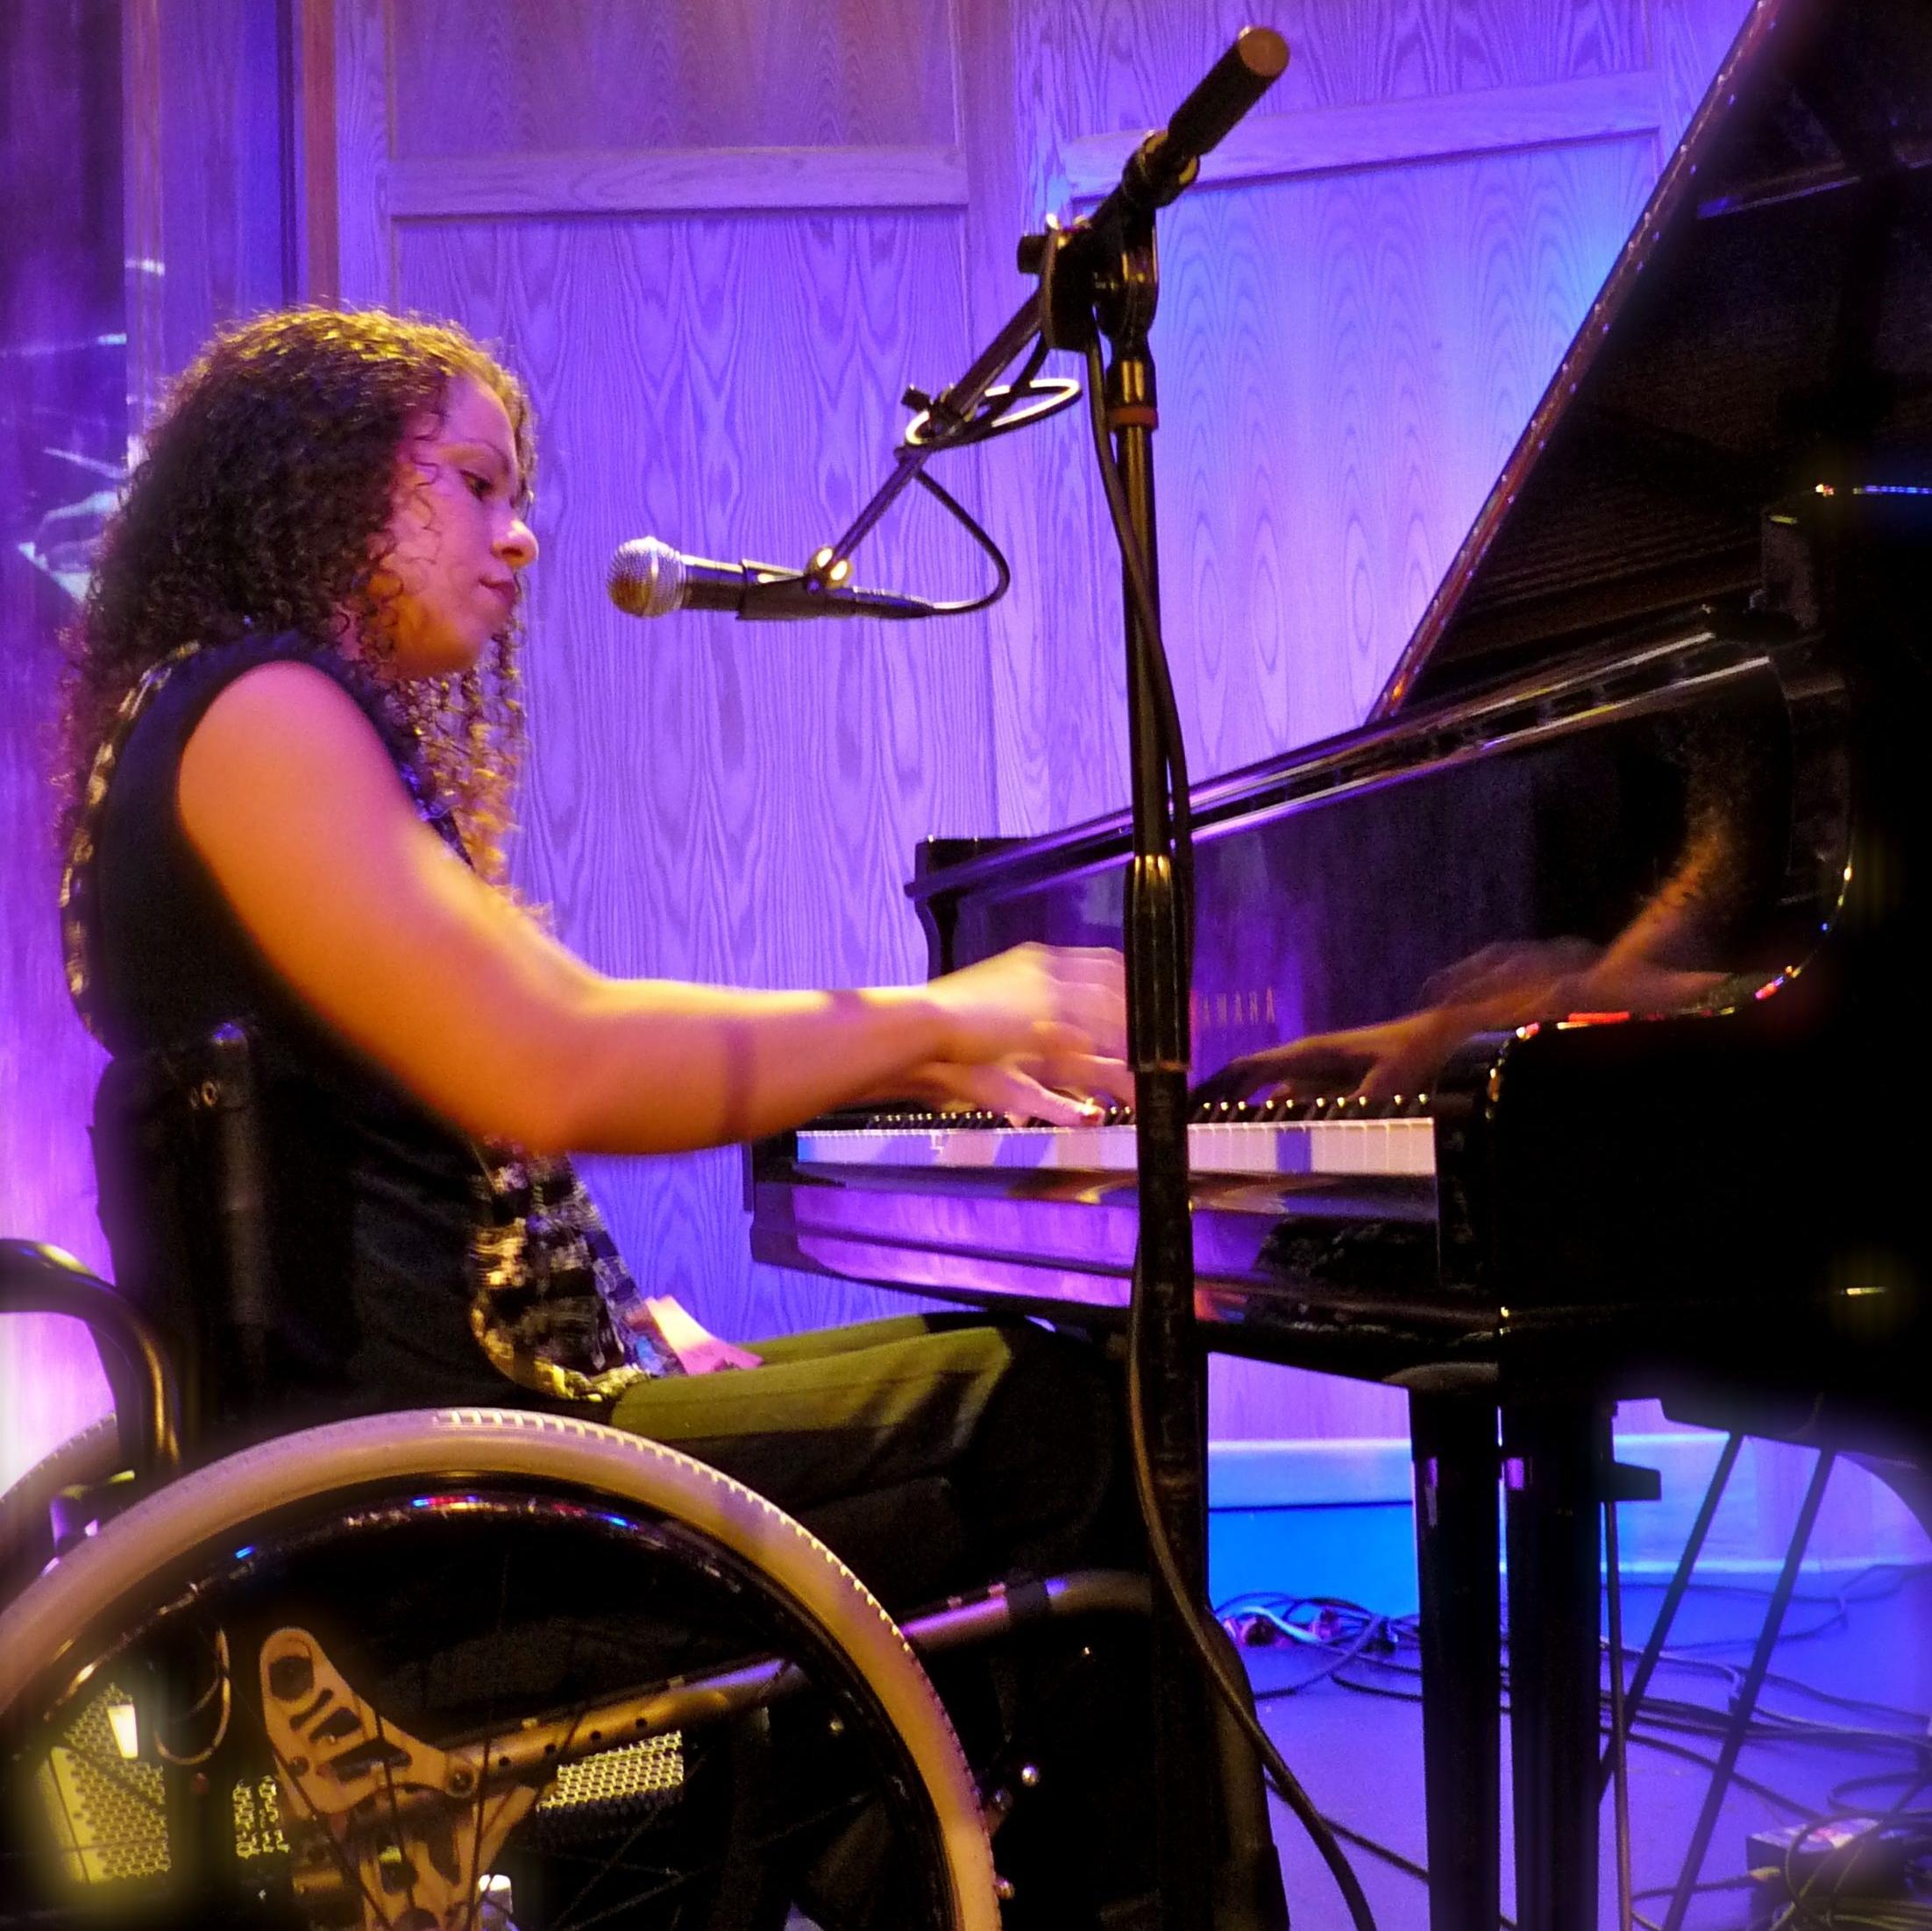 Emily Mathis, 2009, 2012